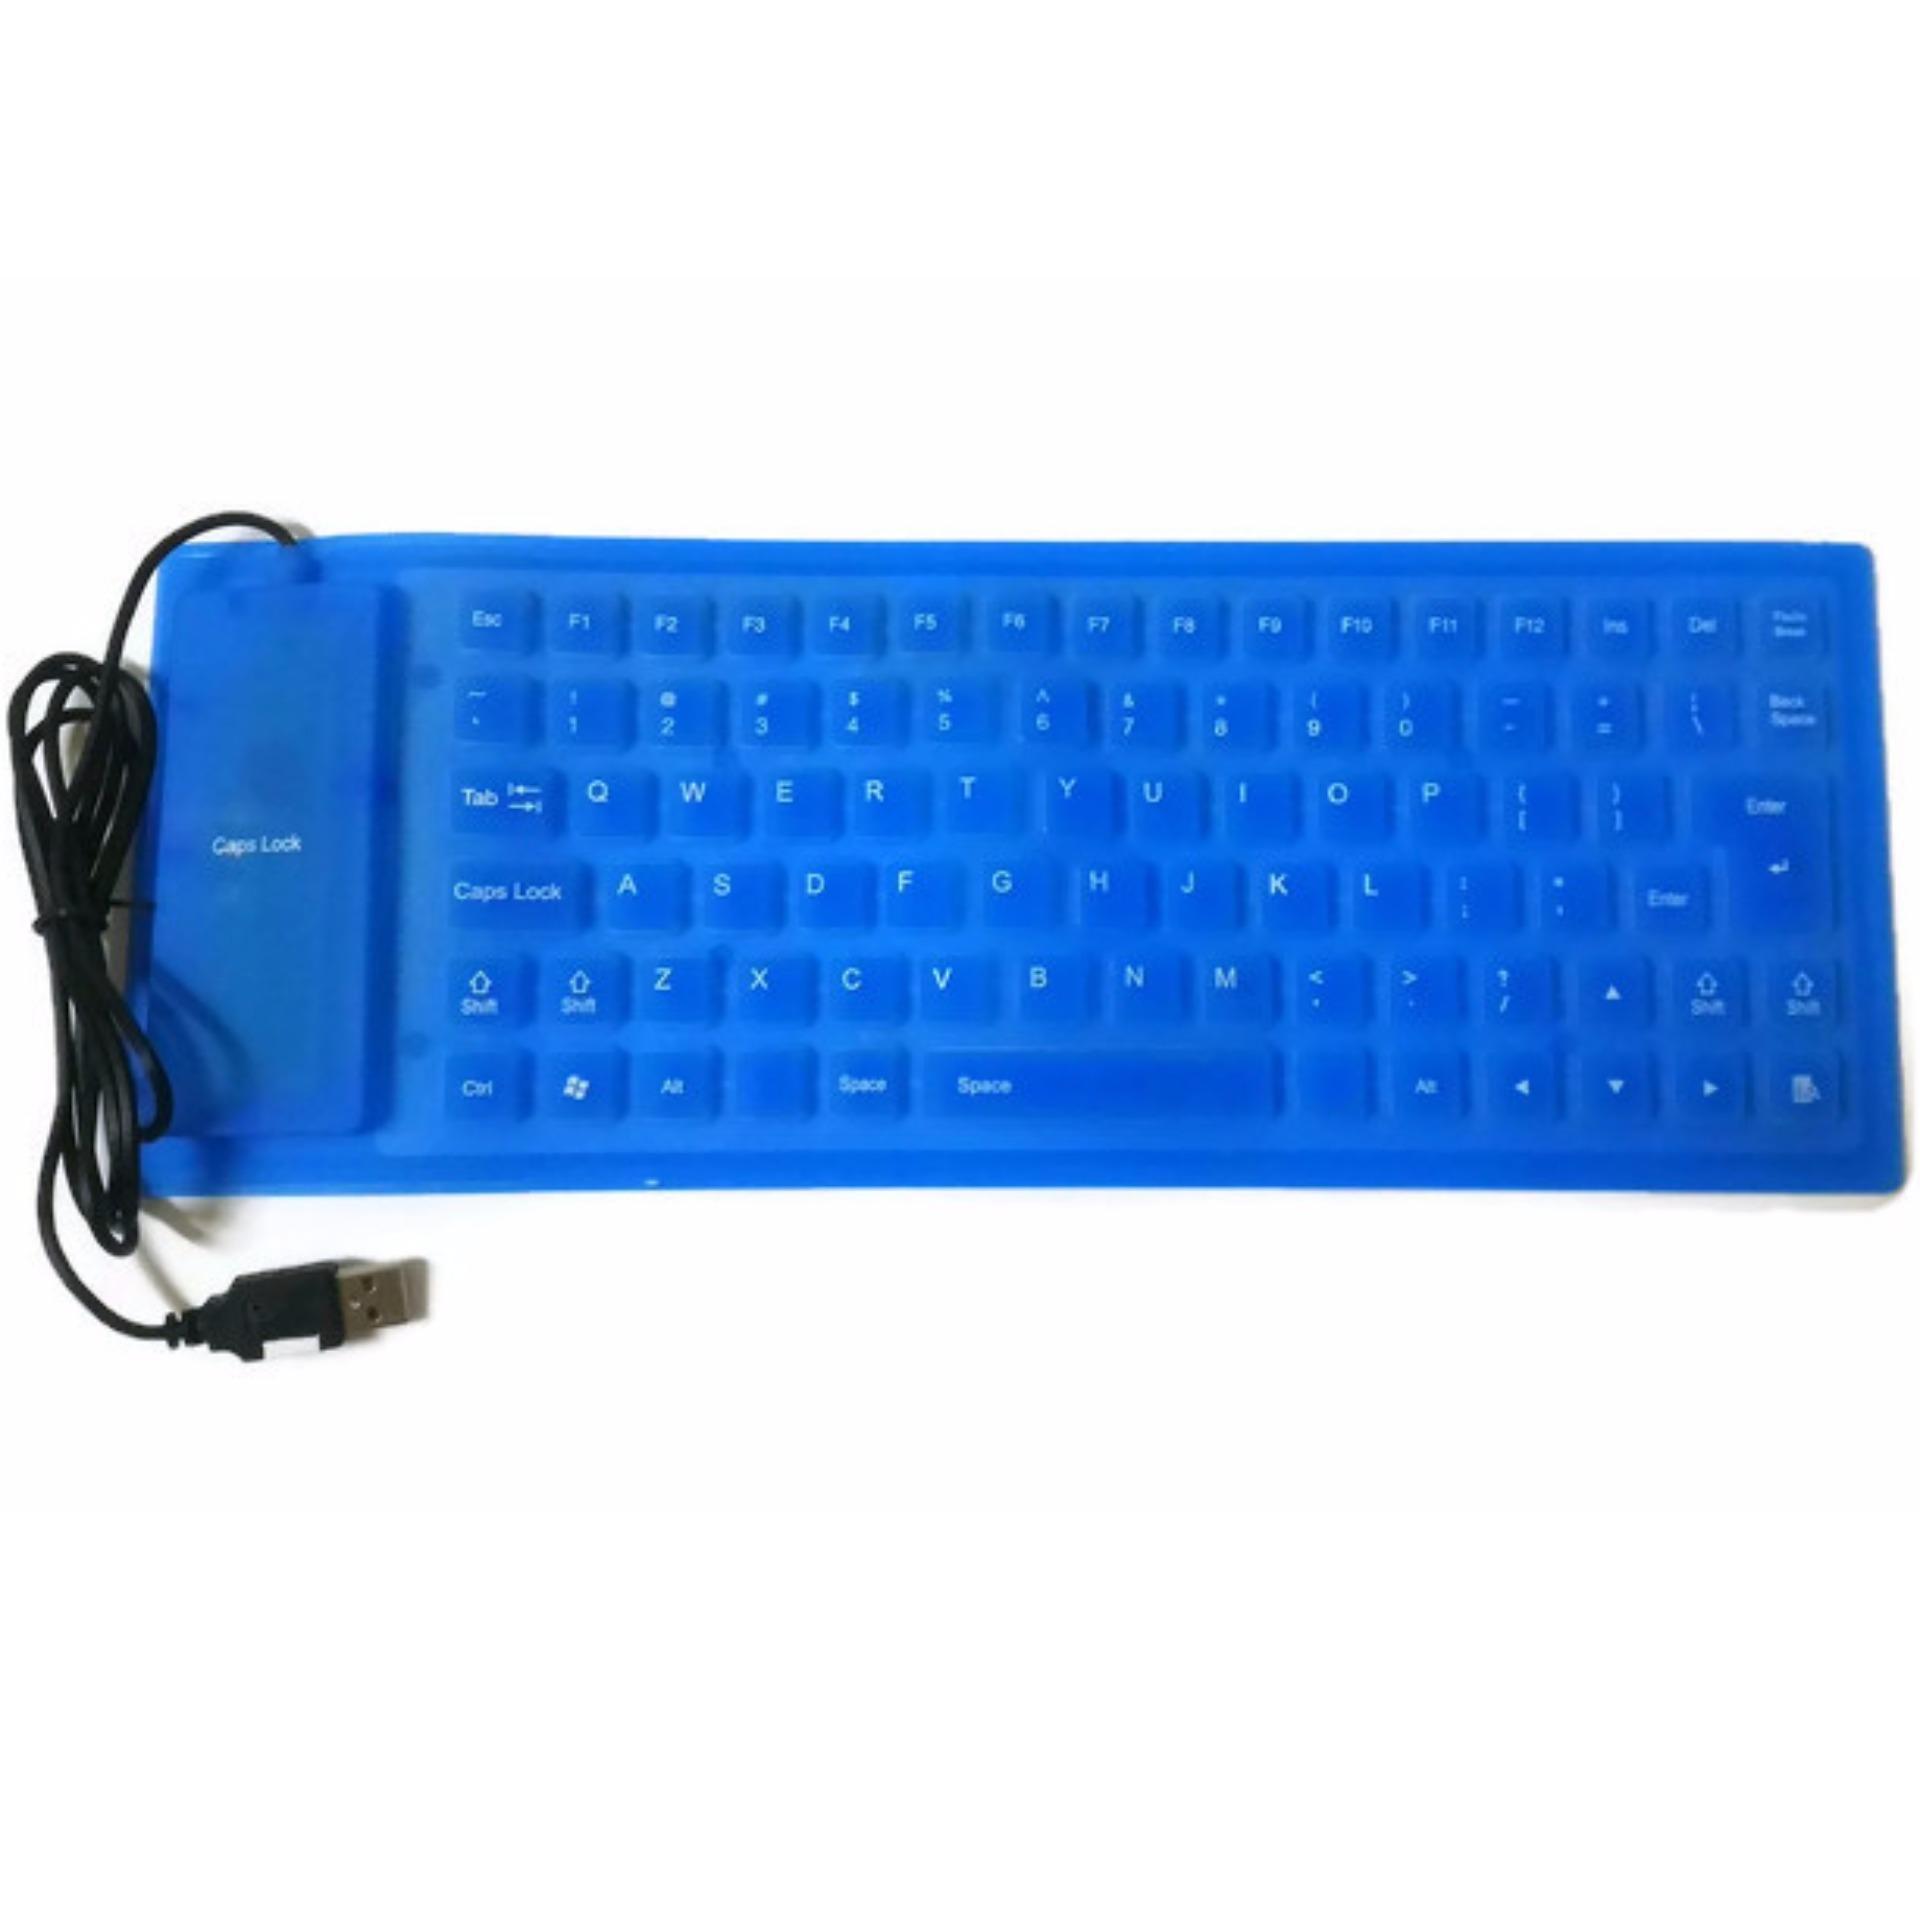 Fitur Keyboard Fleksibel Usb Silicone Bisa Di Lipat Hitam Biru Dan Votre Basic Kb2308 Portable